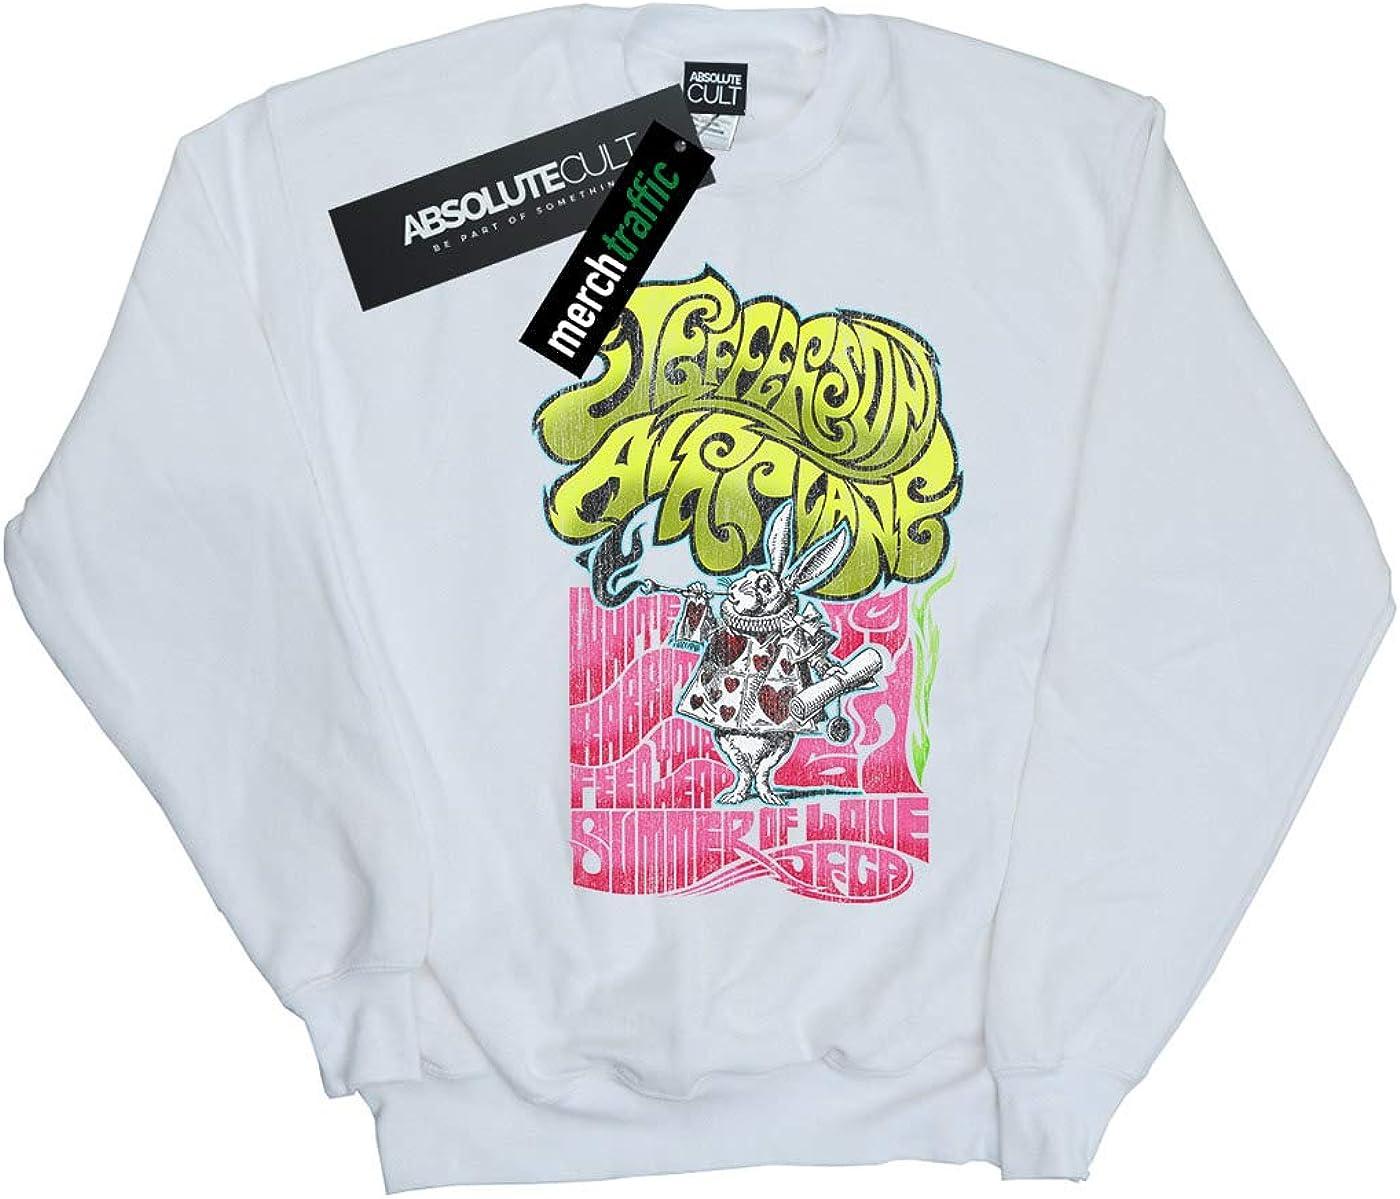 Jefferson Airplane Girls Summer of Love Sweatshirt